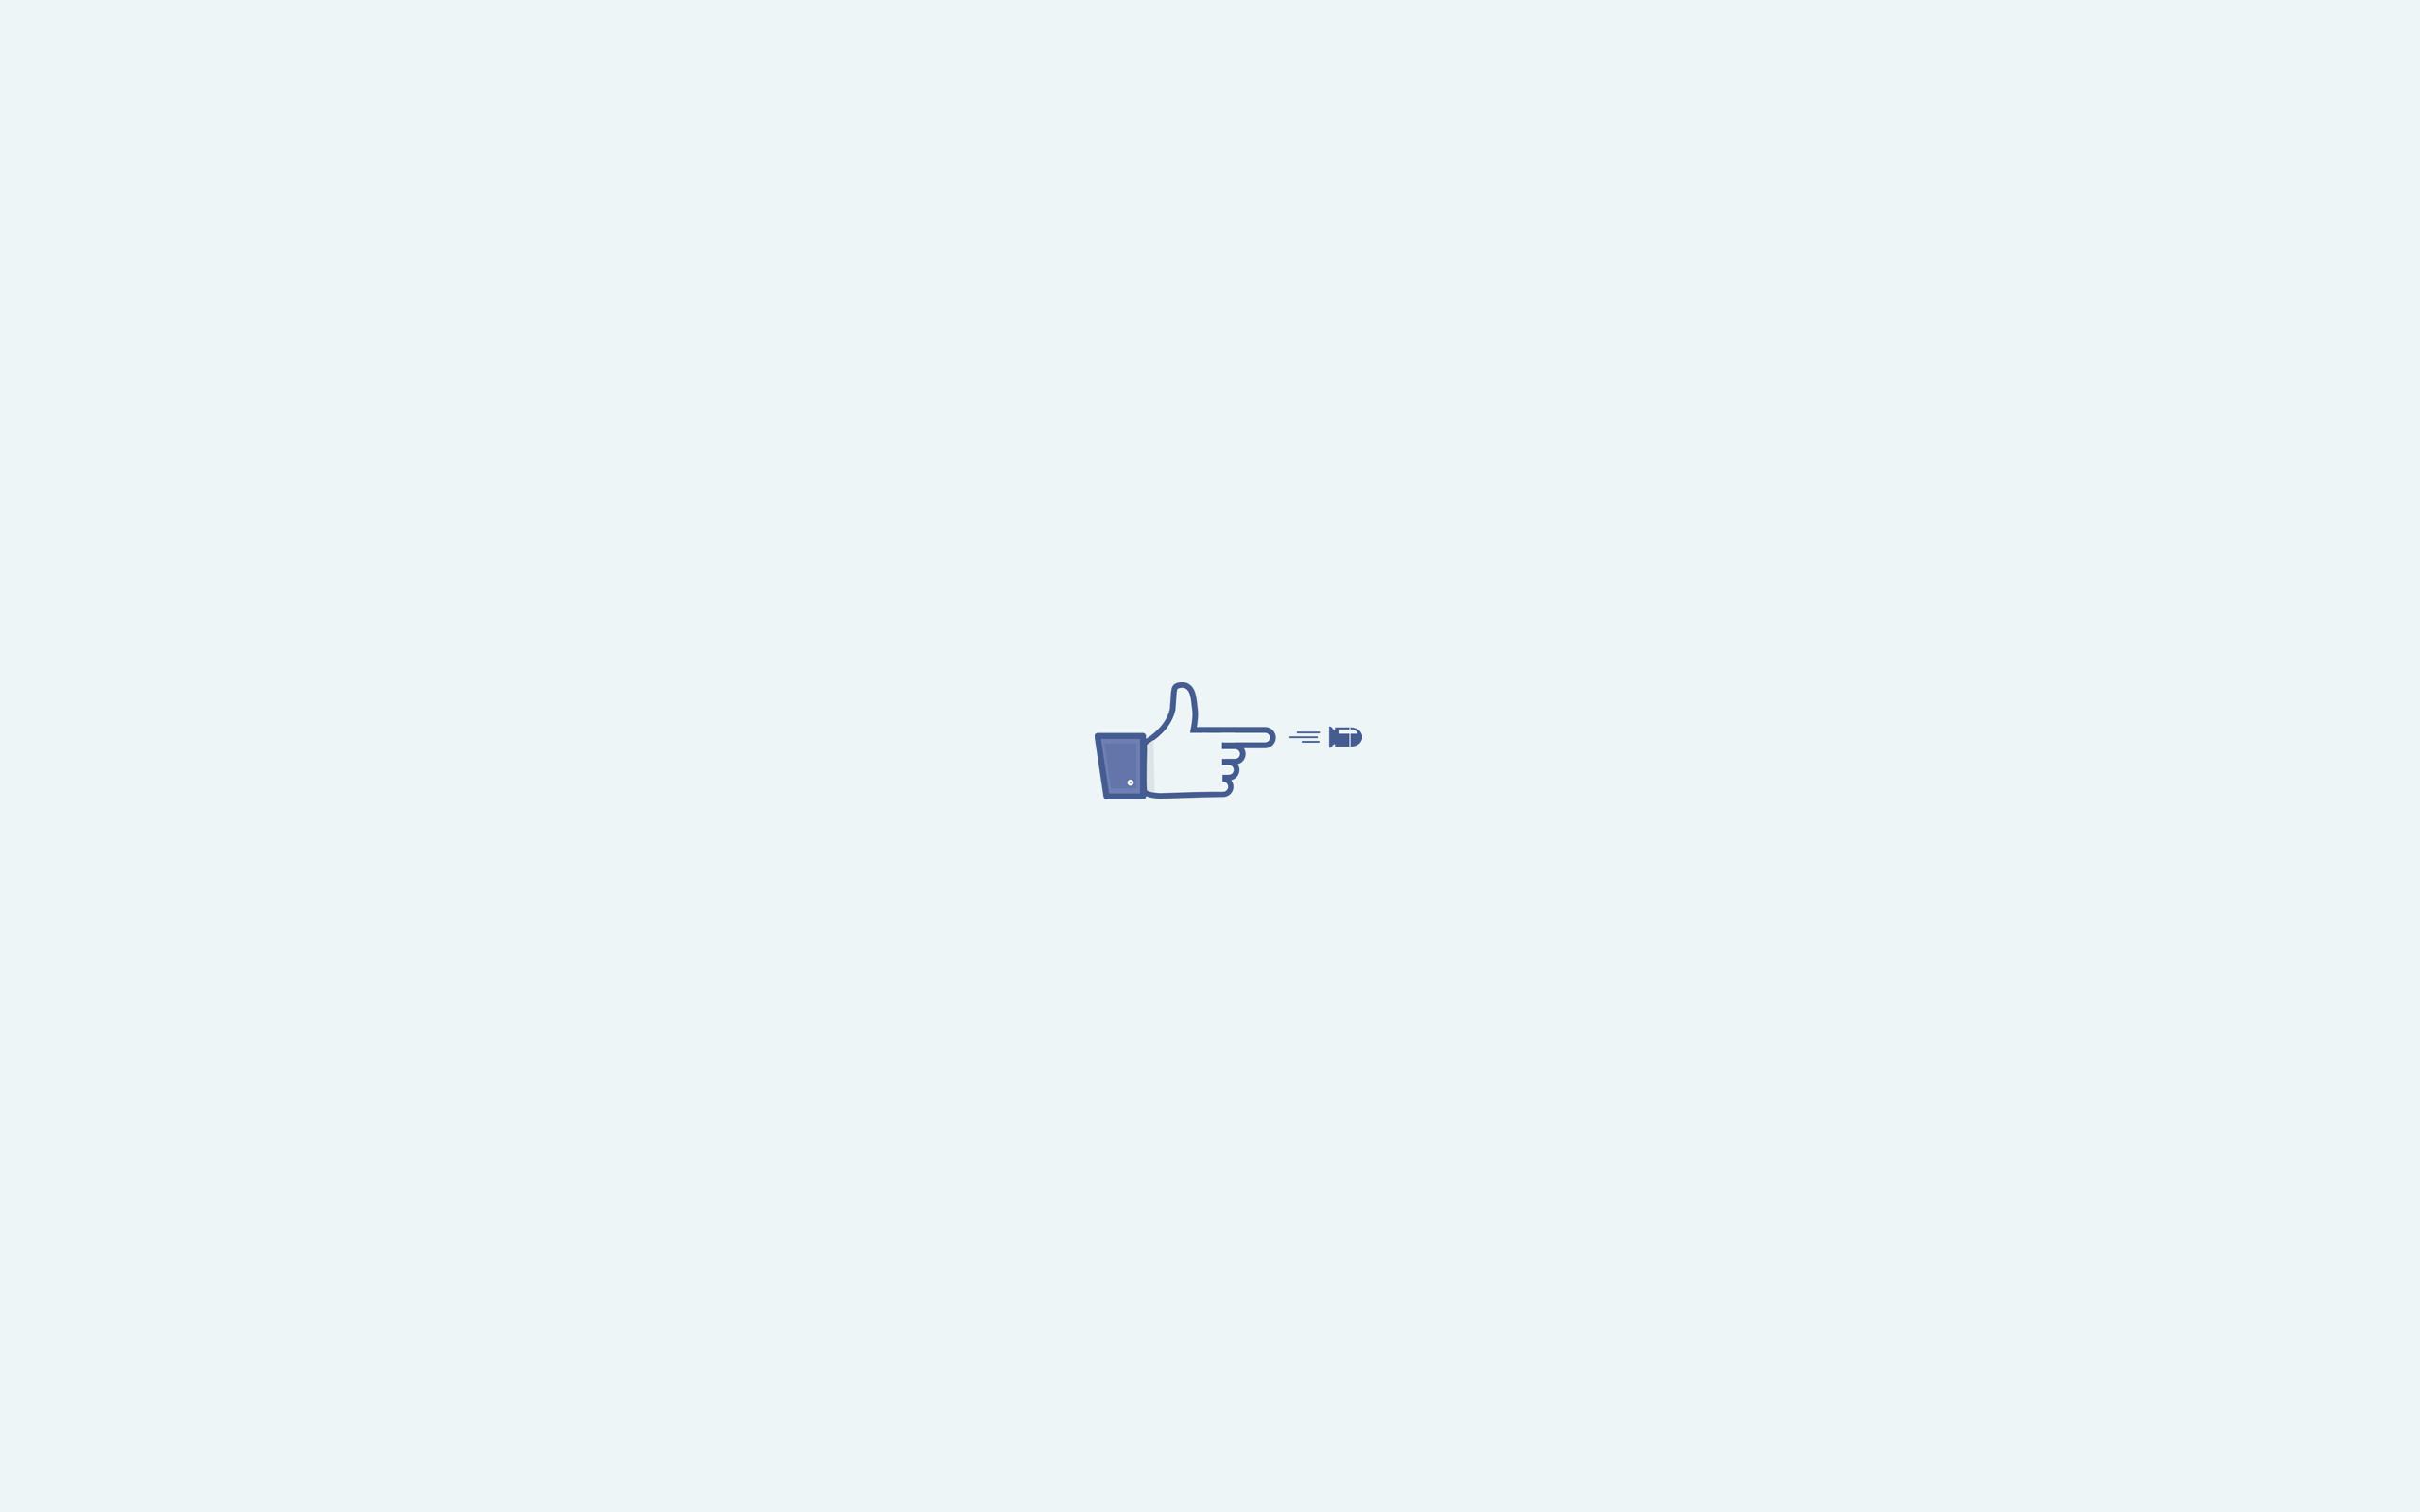 Facebook Like Minimalist Wallpaper